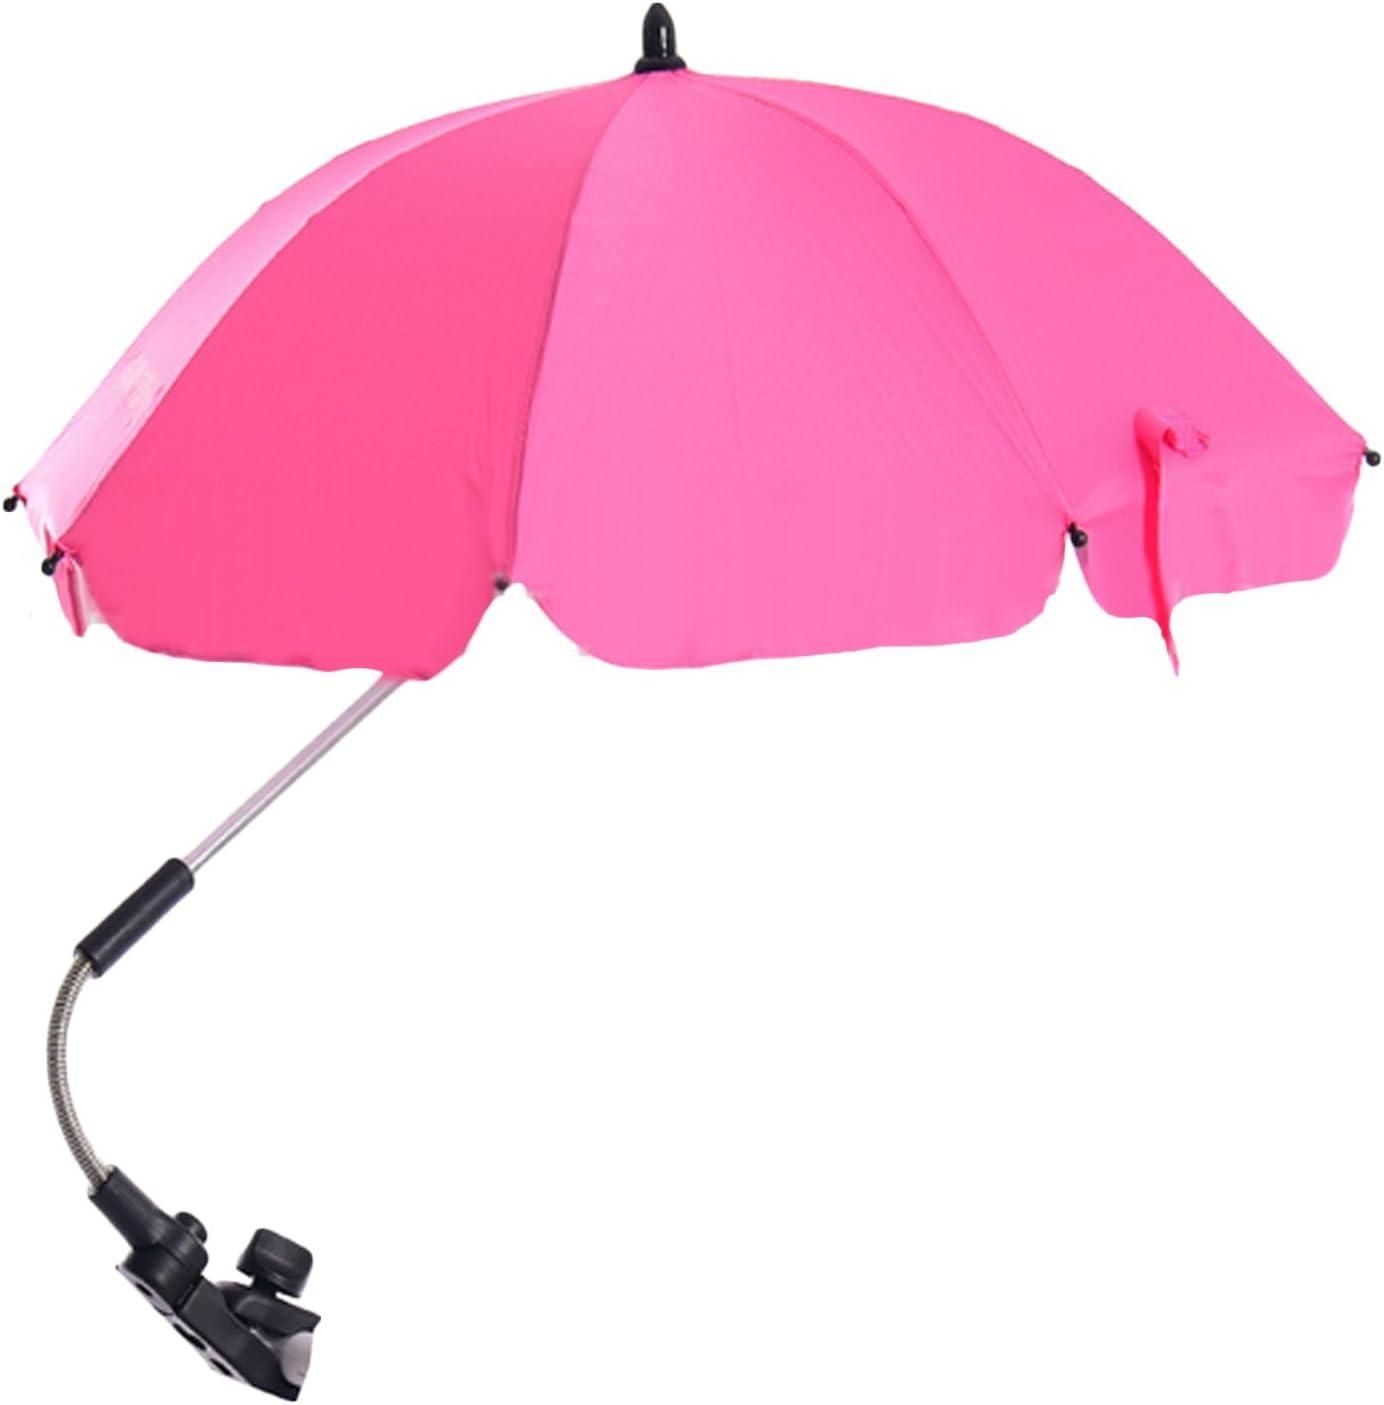 Pink Baby Stroller Wheelchair Umbrella,Wheelchair Pushchair Baby Stroller Umbrella and Holder Parasol UV Rays Rain Sun Canopy